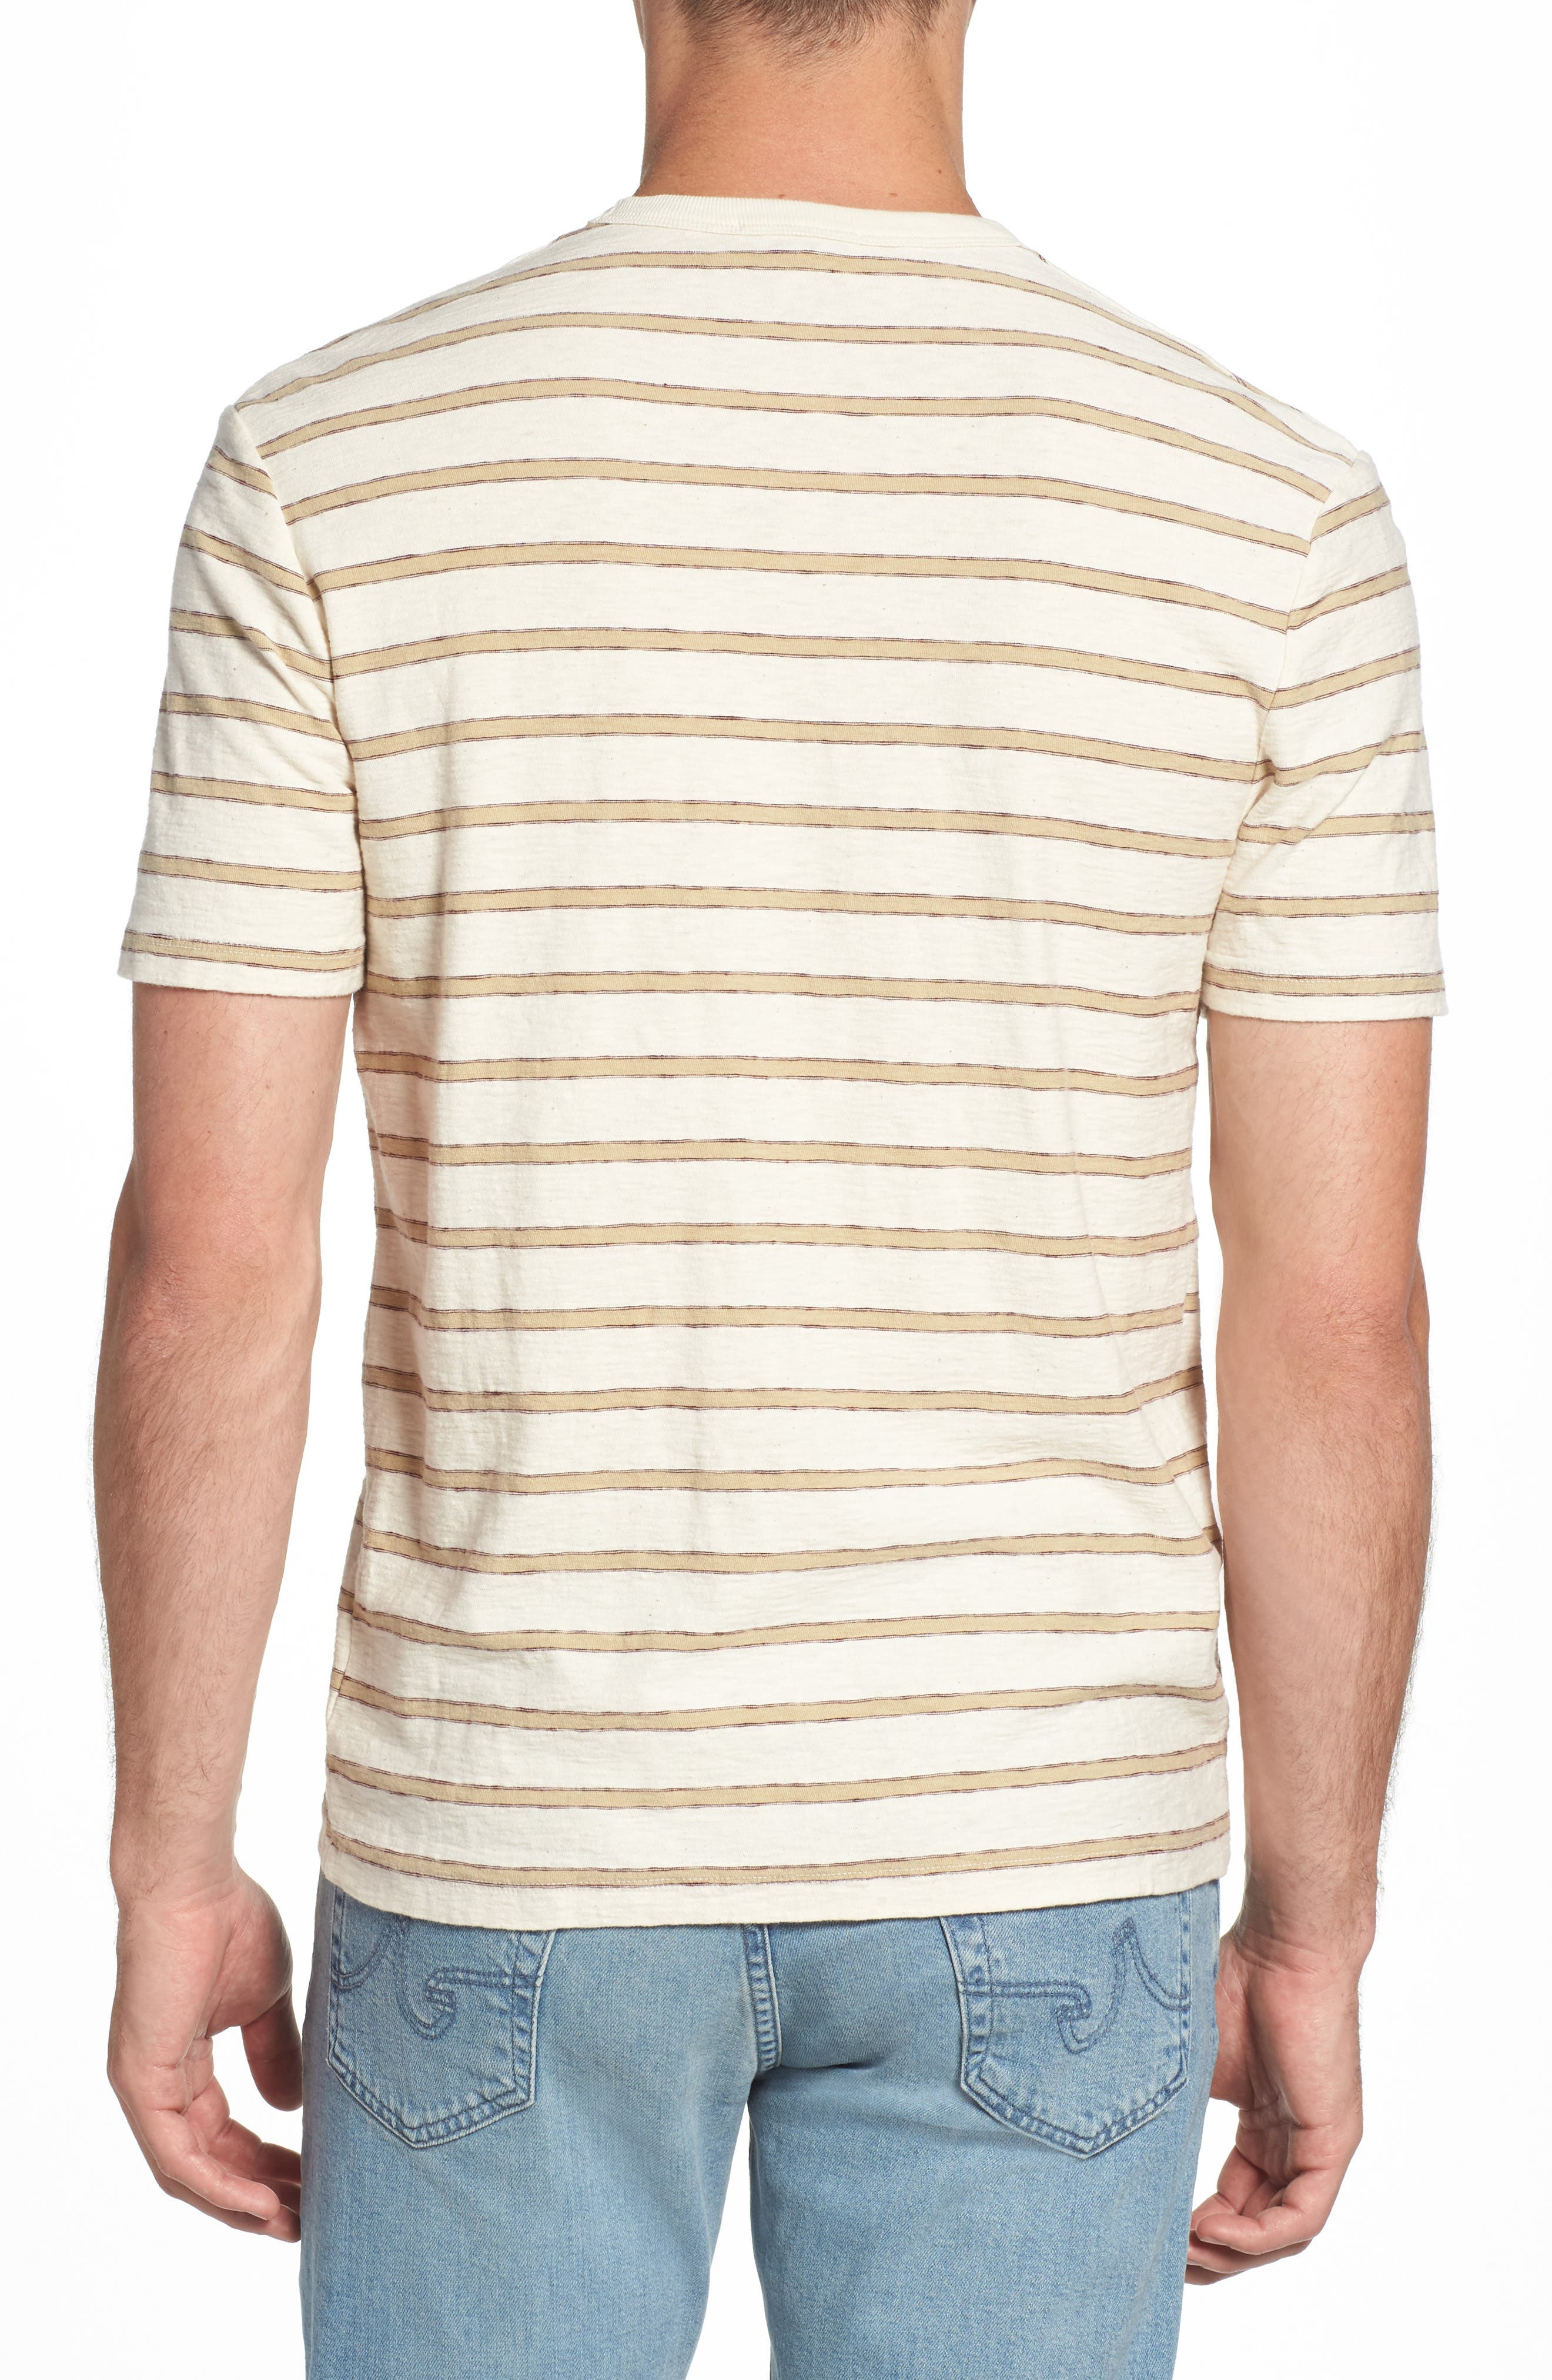 Vintage Stripe Pocket T-Shirt,                             Alternate thumbnail 2, color,                             Cotton Stripe